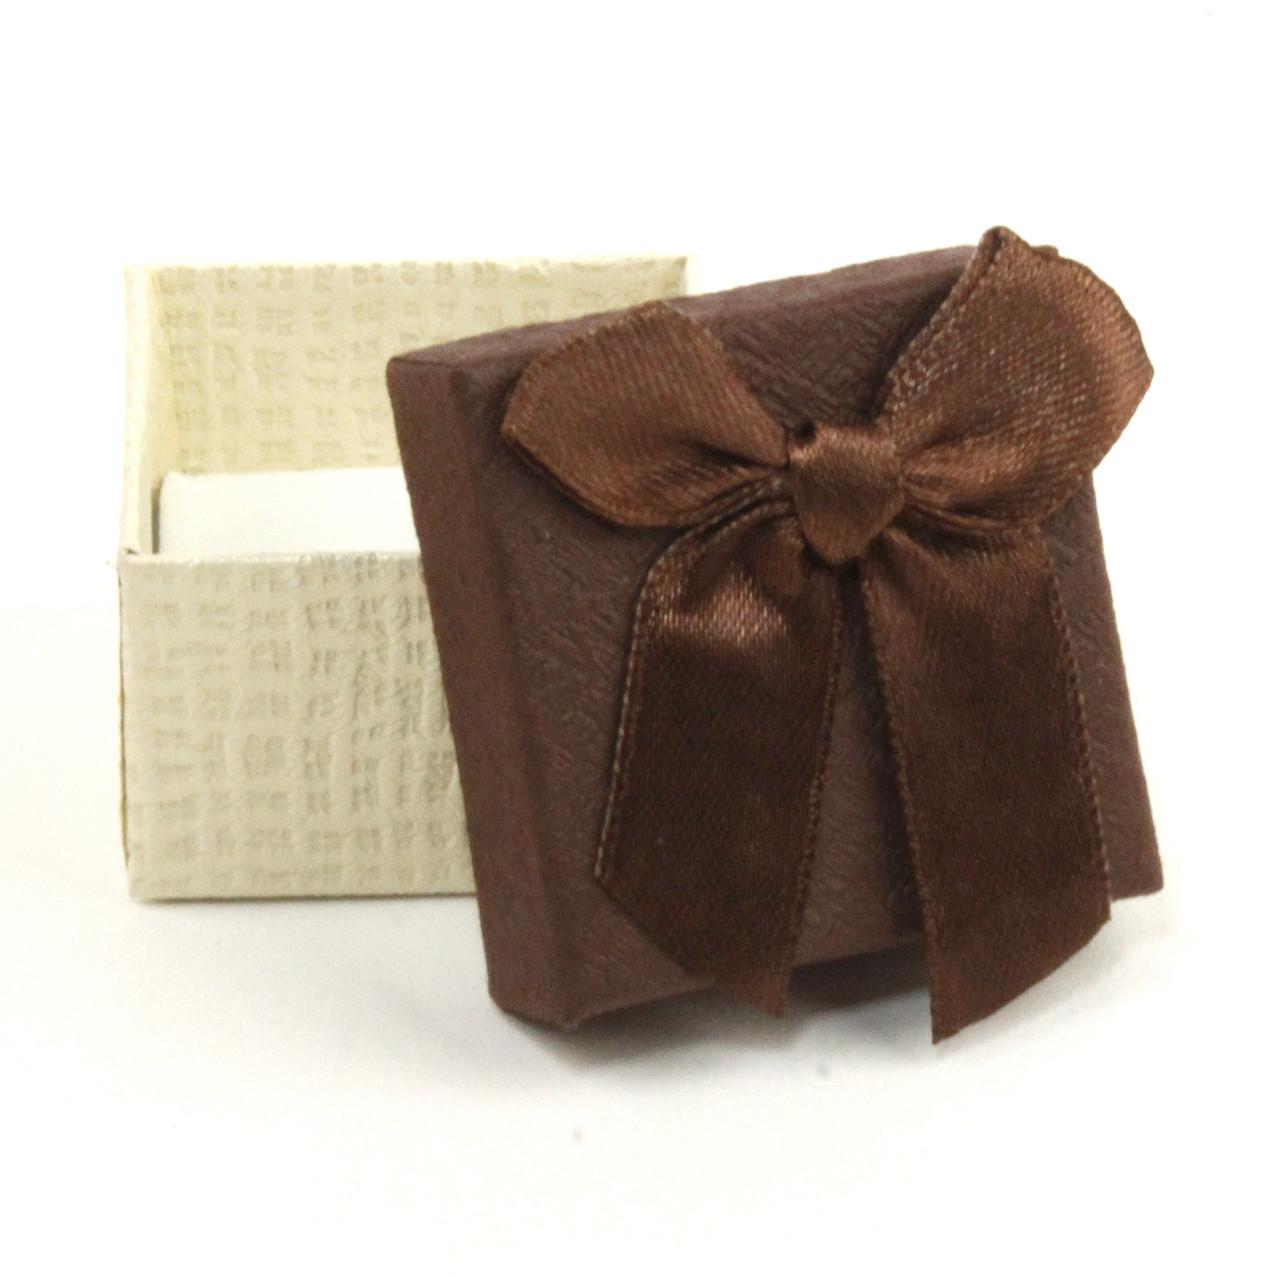 Подарочная коробочка под кольцо коричневая 5 х 5 х 3 см